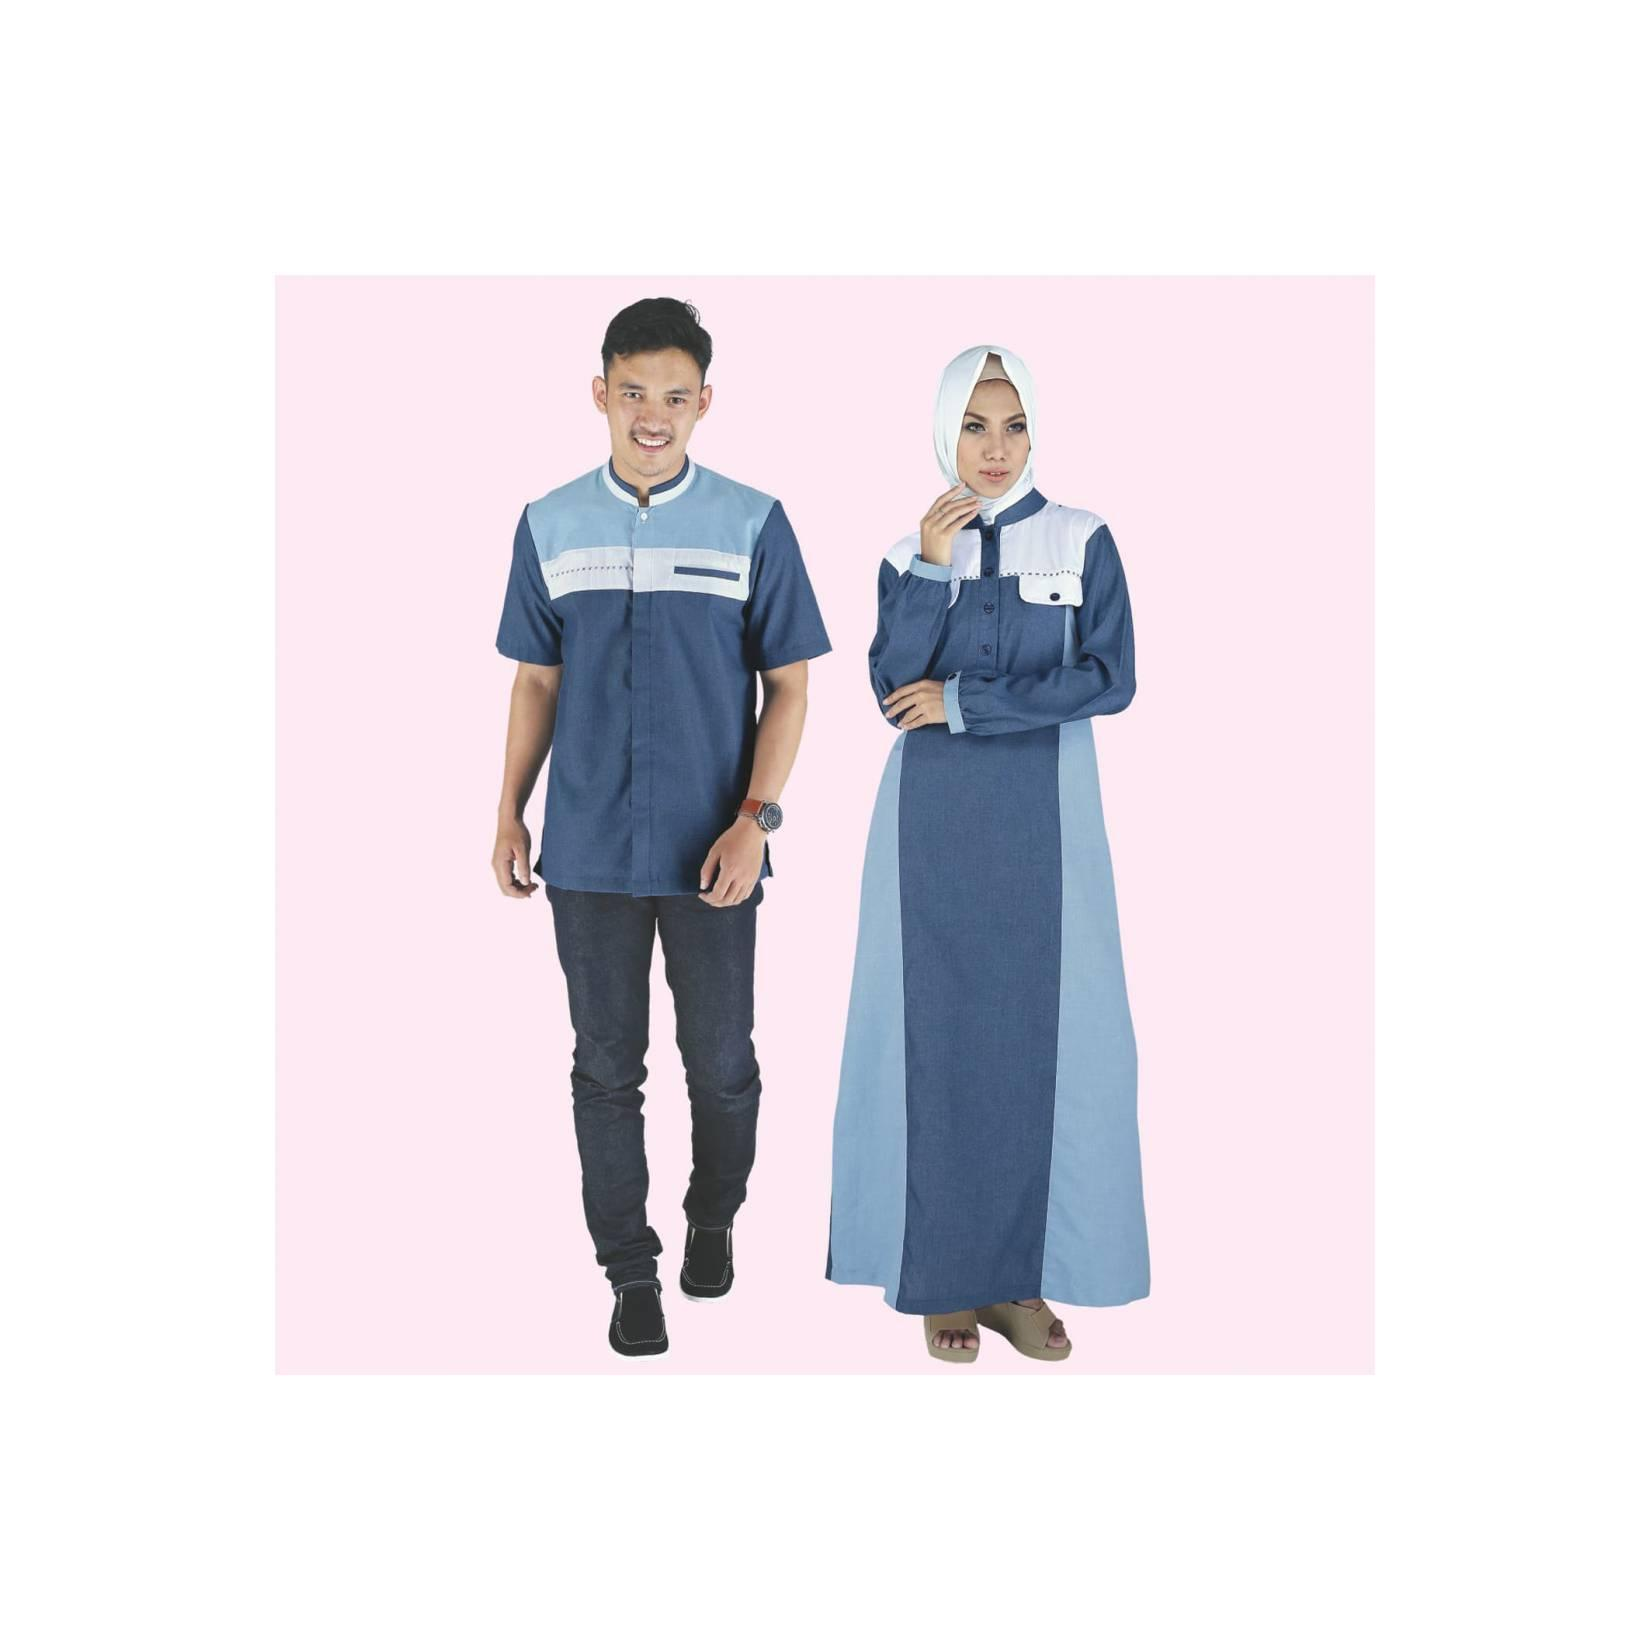 Baju Busana Muslim Couple Gamis Pakistan Dress Cewek Cowok Biru